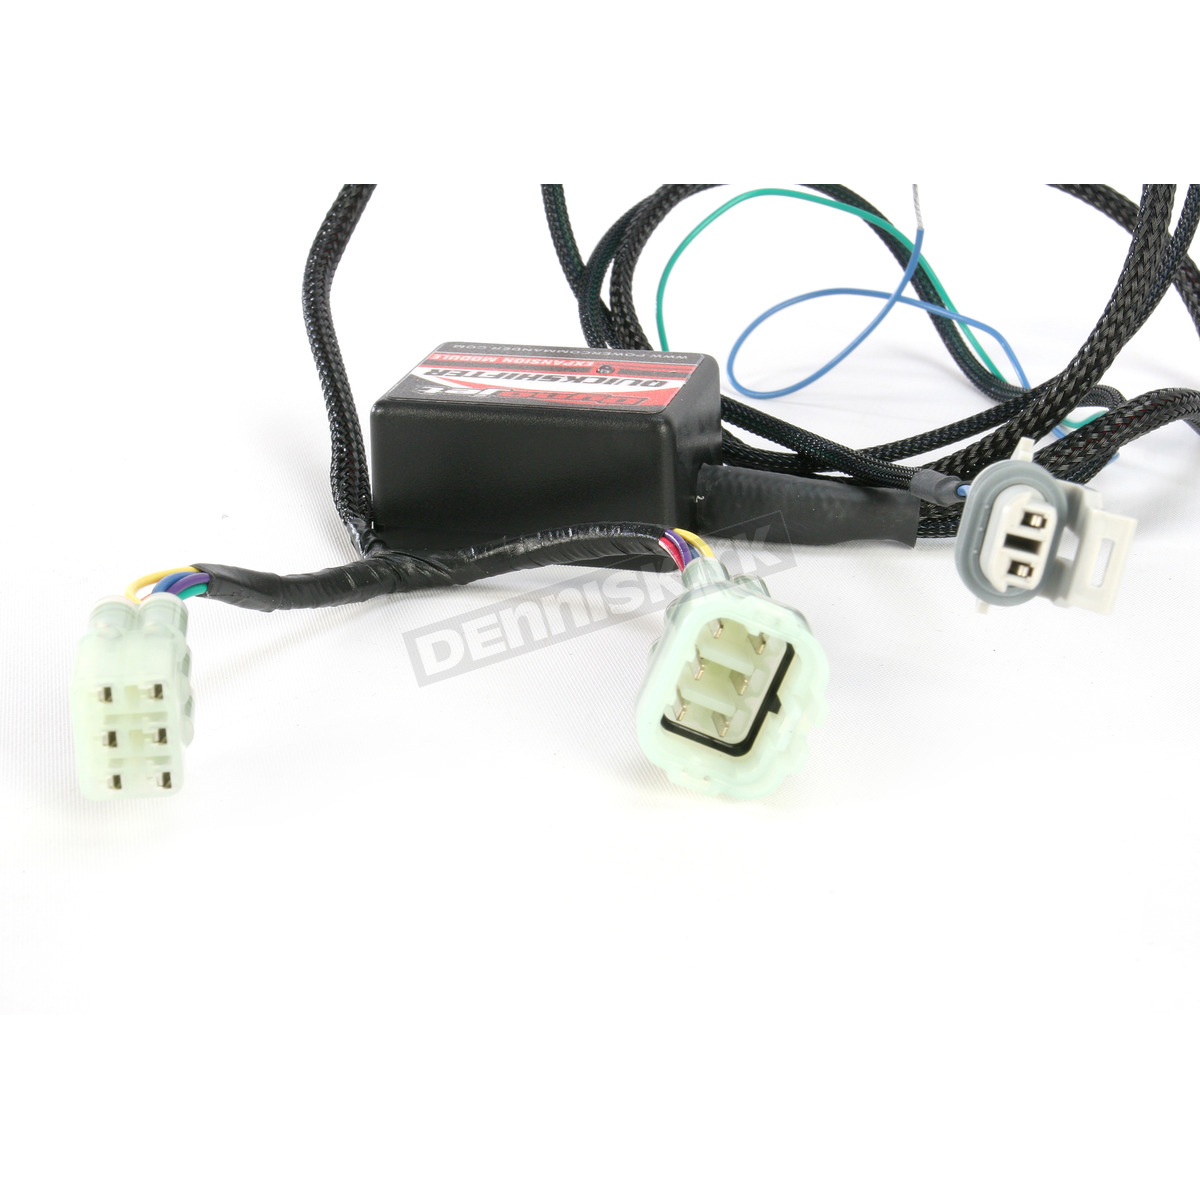 hight resolution of  power commander quick shifter wiring diagram on power commander installation power commander parts